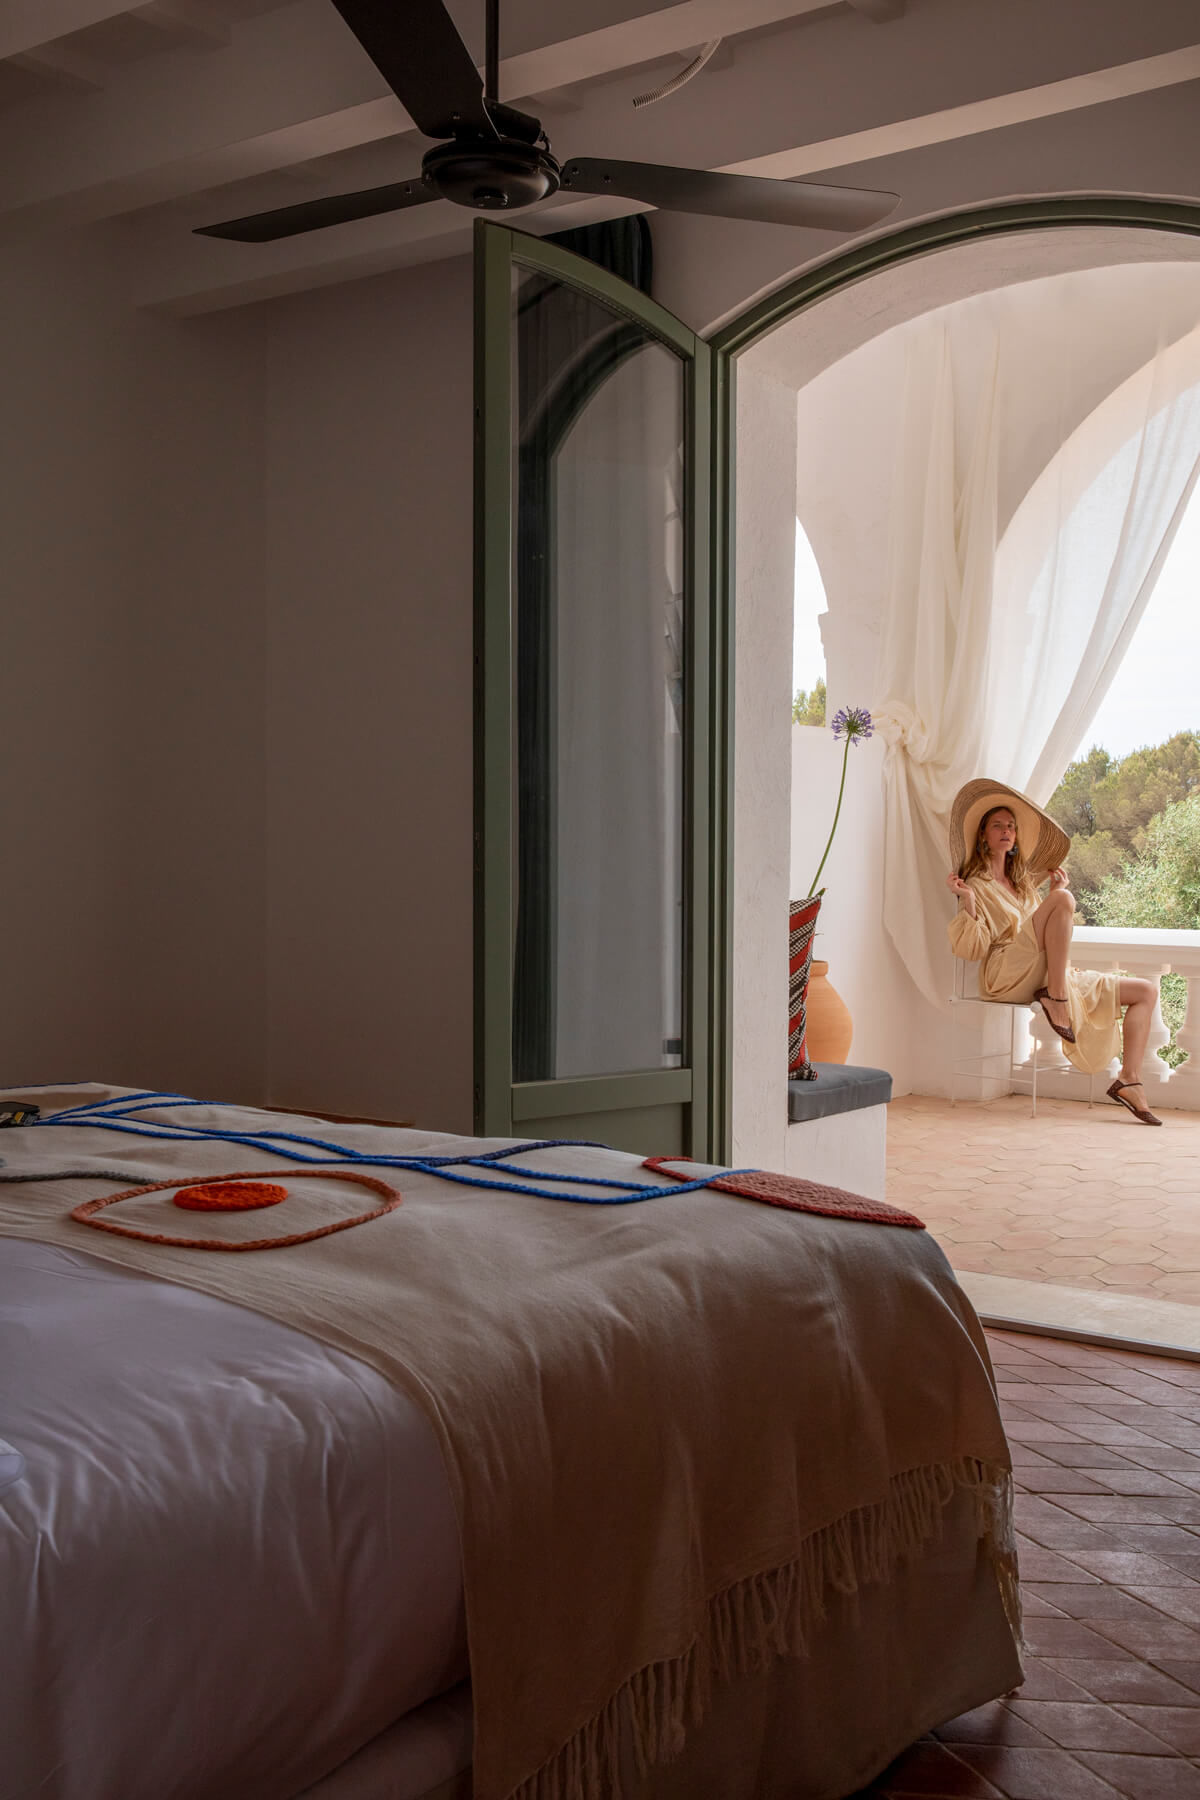 Room Mahon Terrace 5 menorca experimental hotel